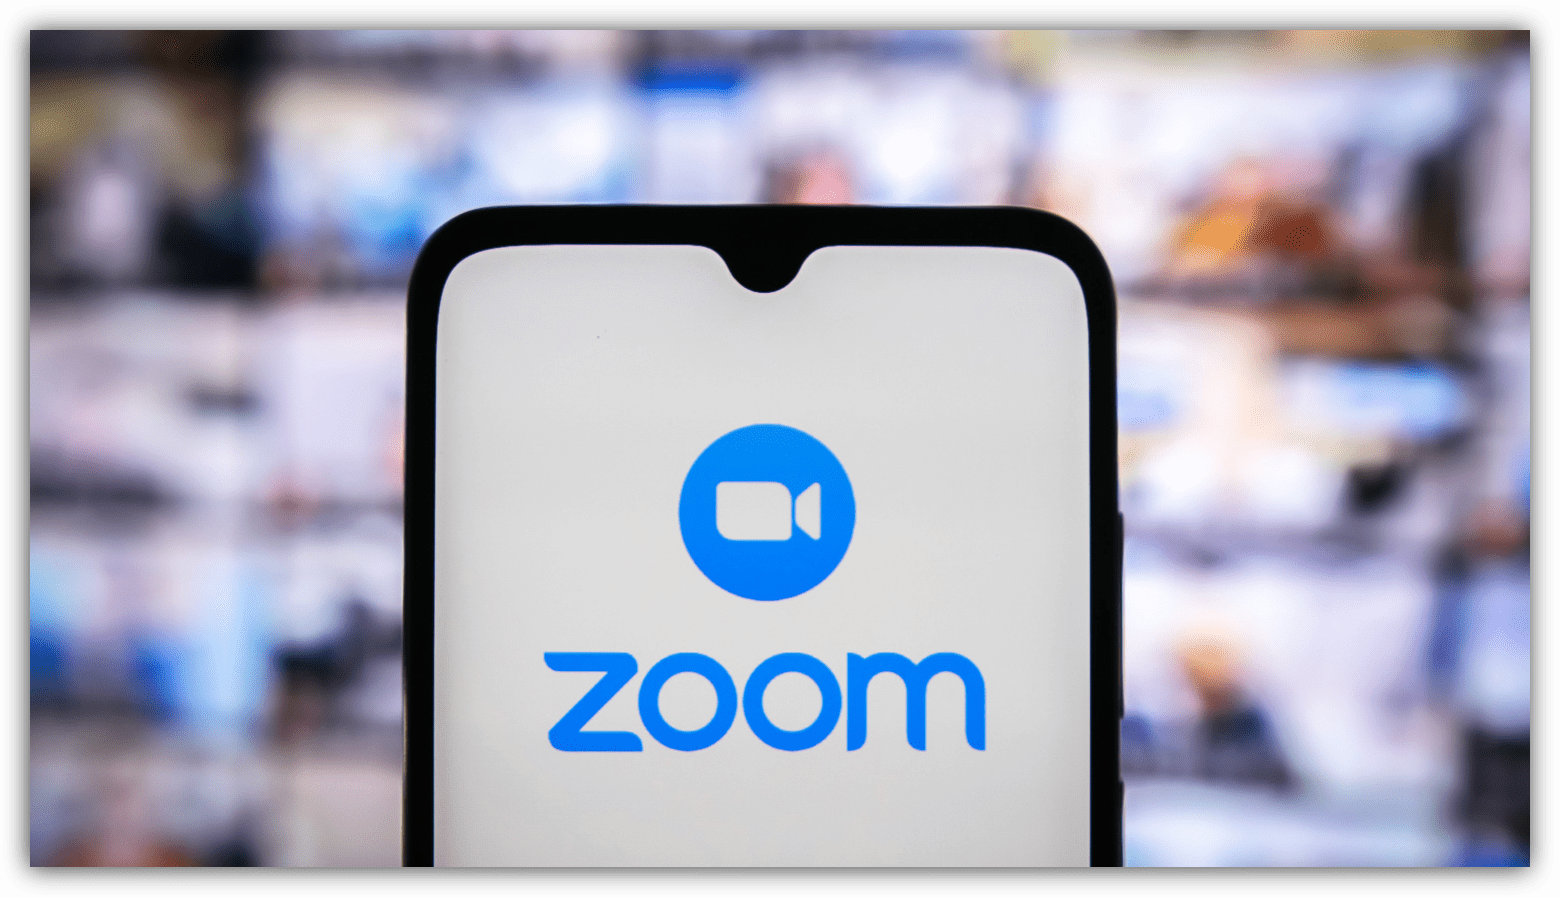 Kartinka-Telefon-s-Zoom.png